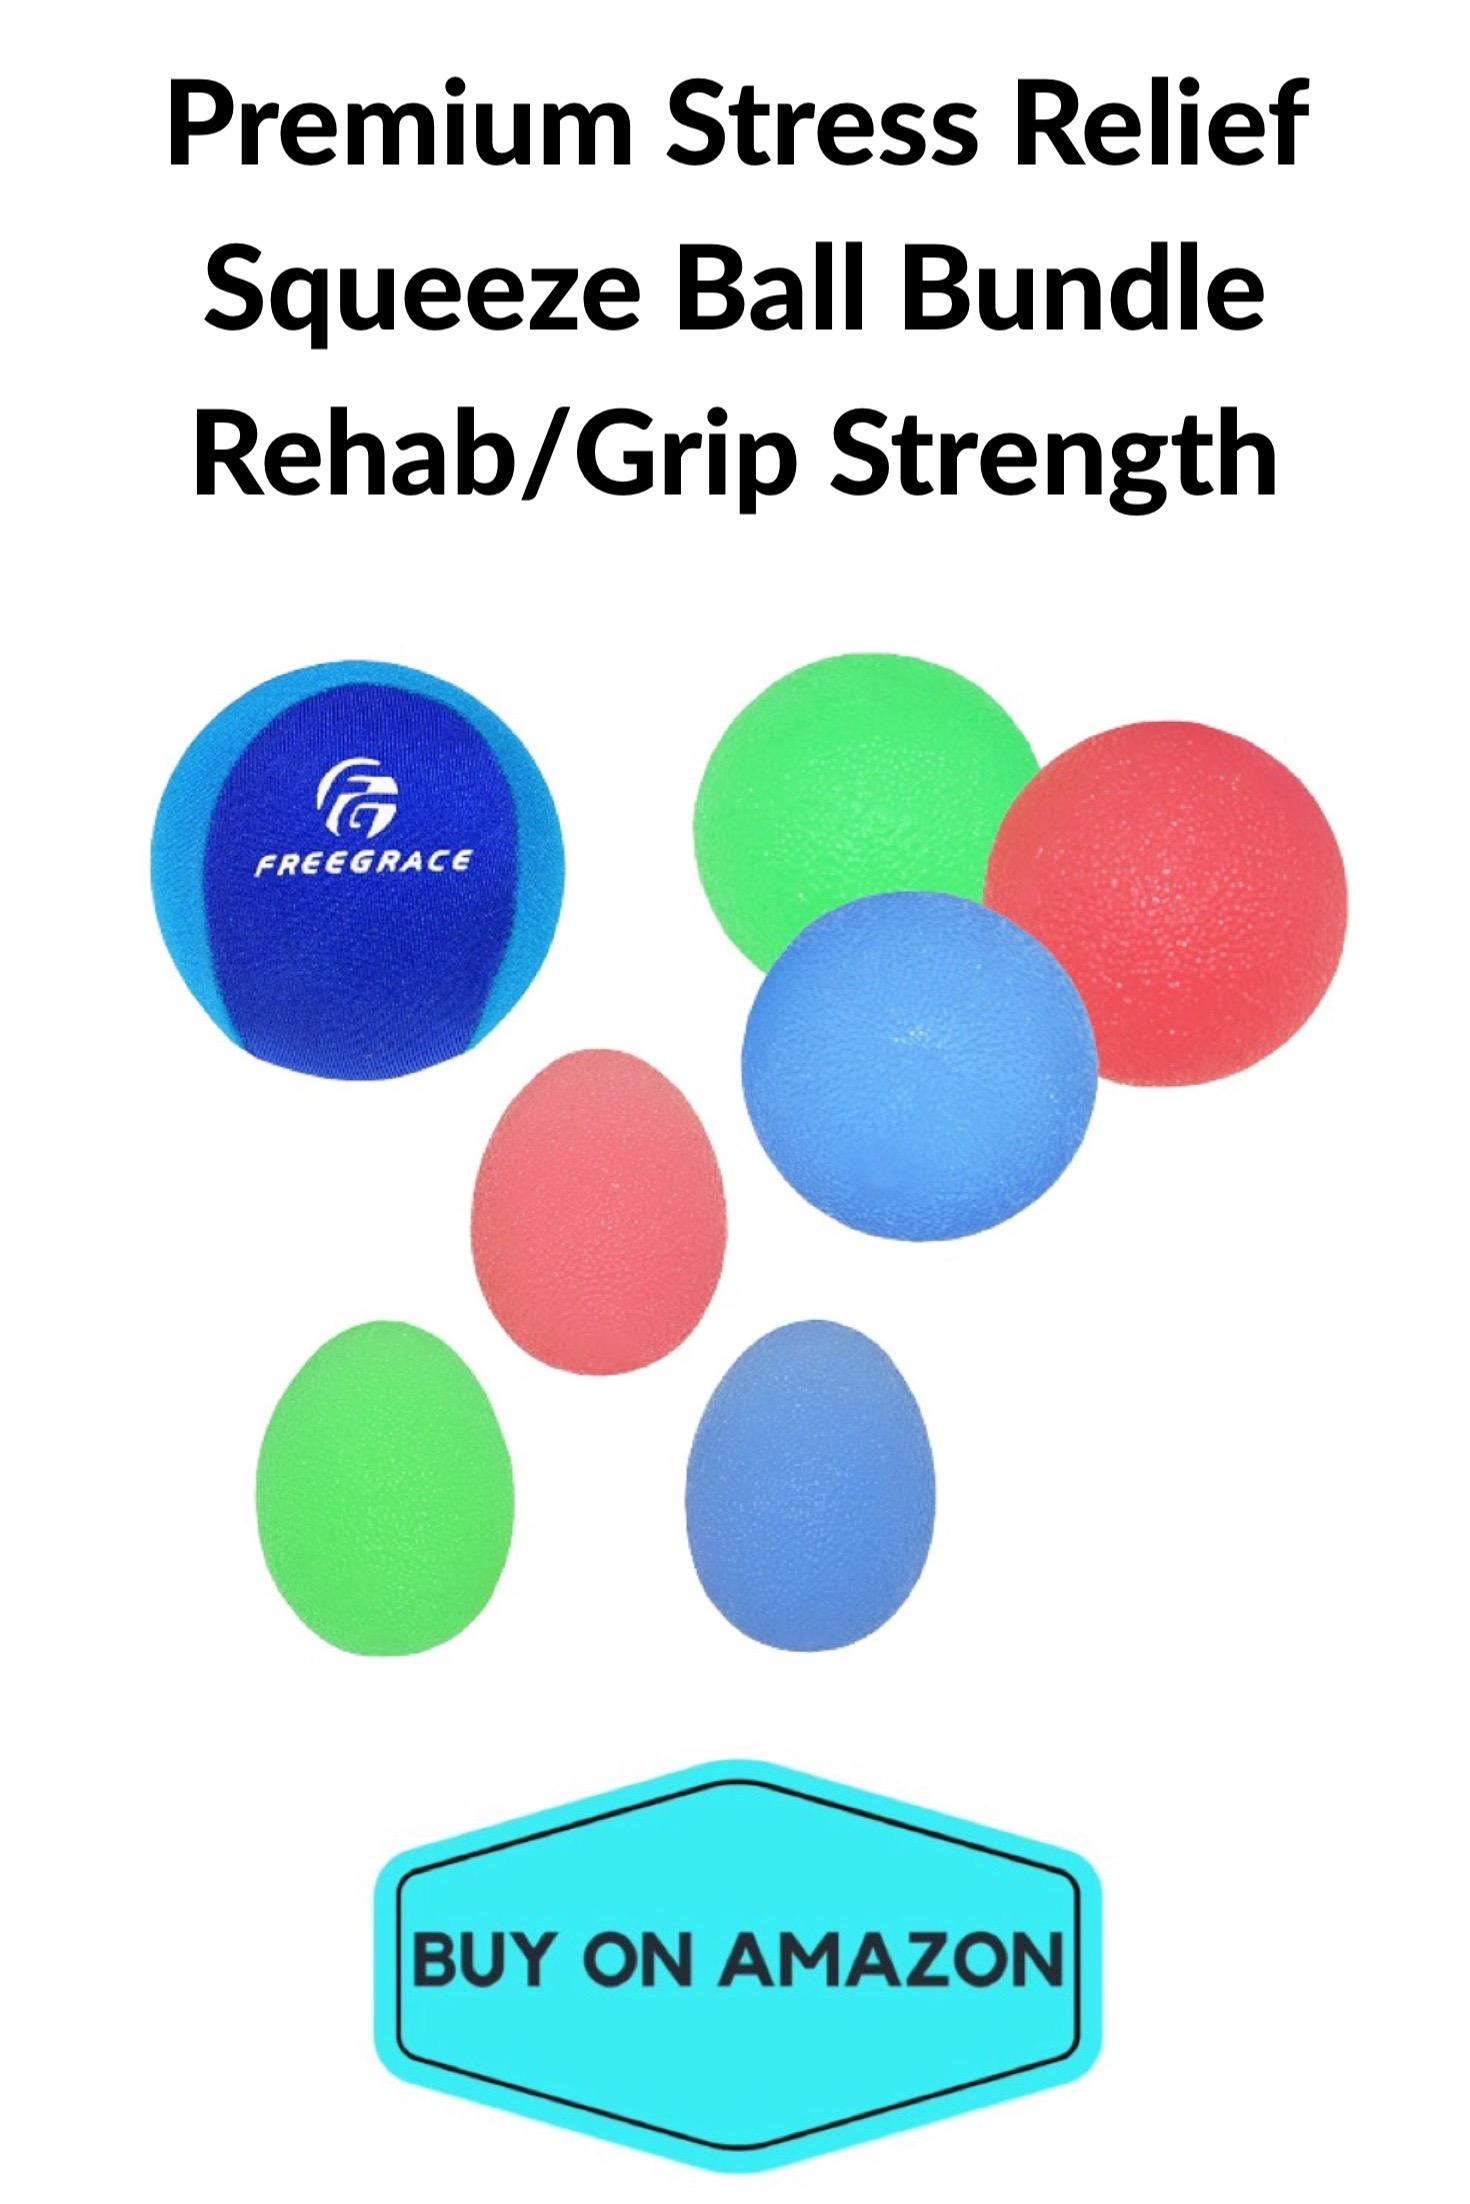 Premium Stress Relief Squeeze Ball Bundle